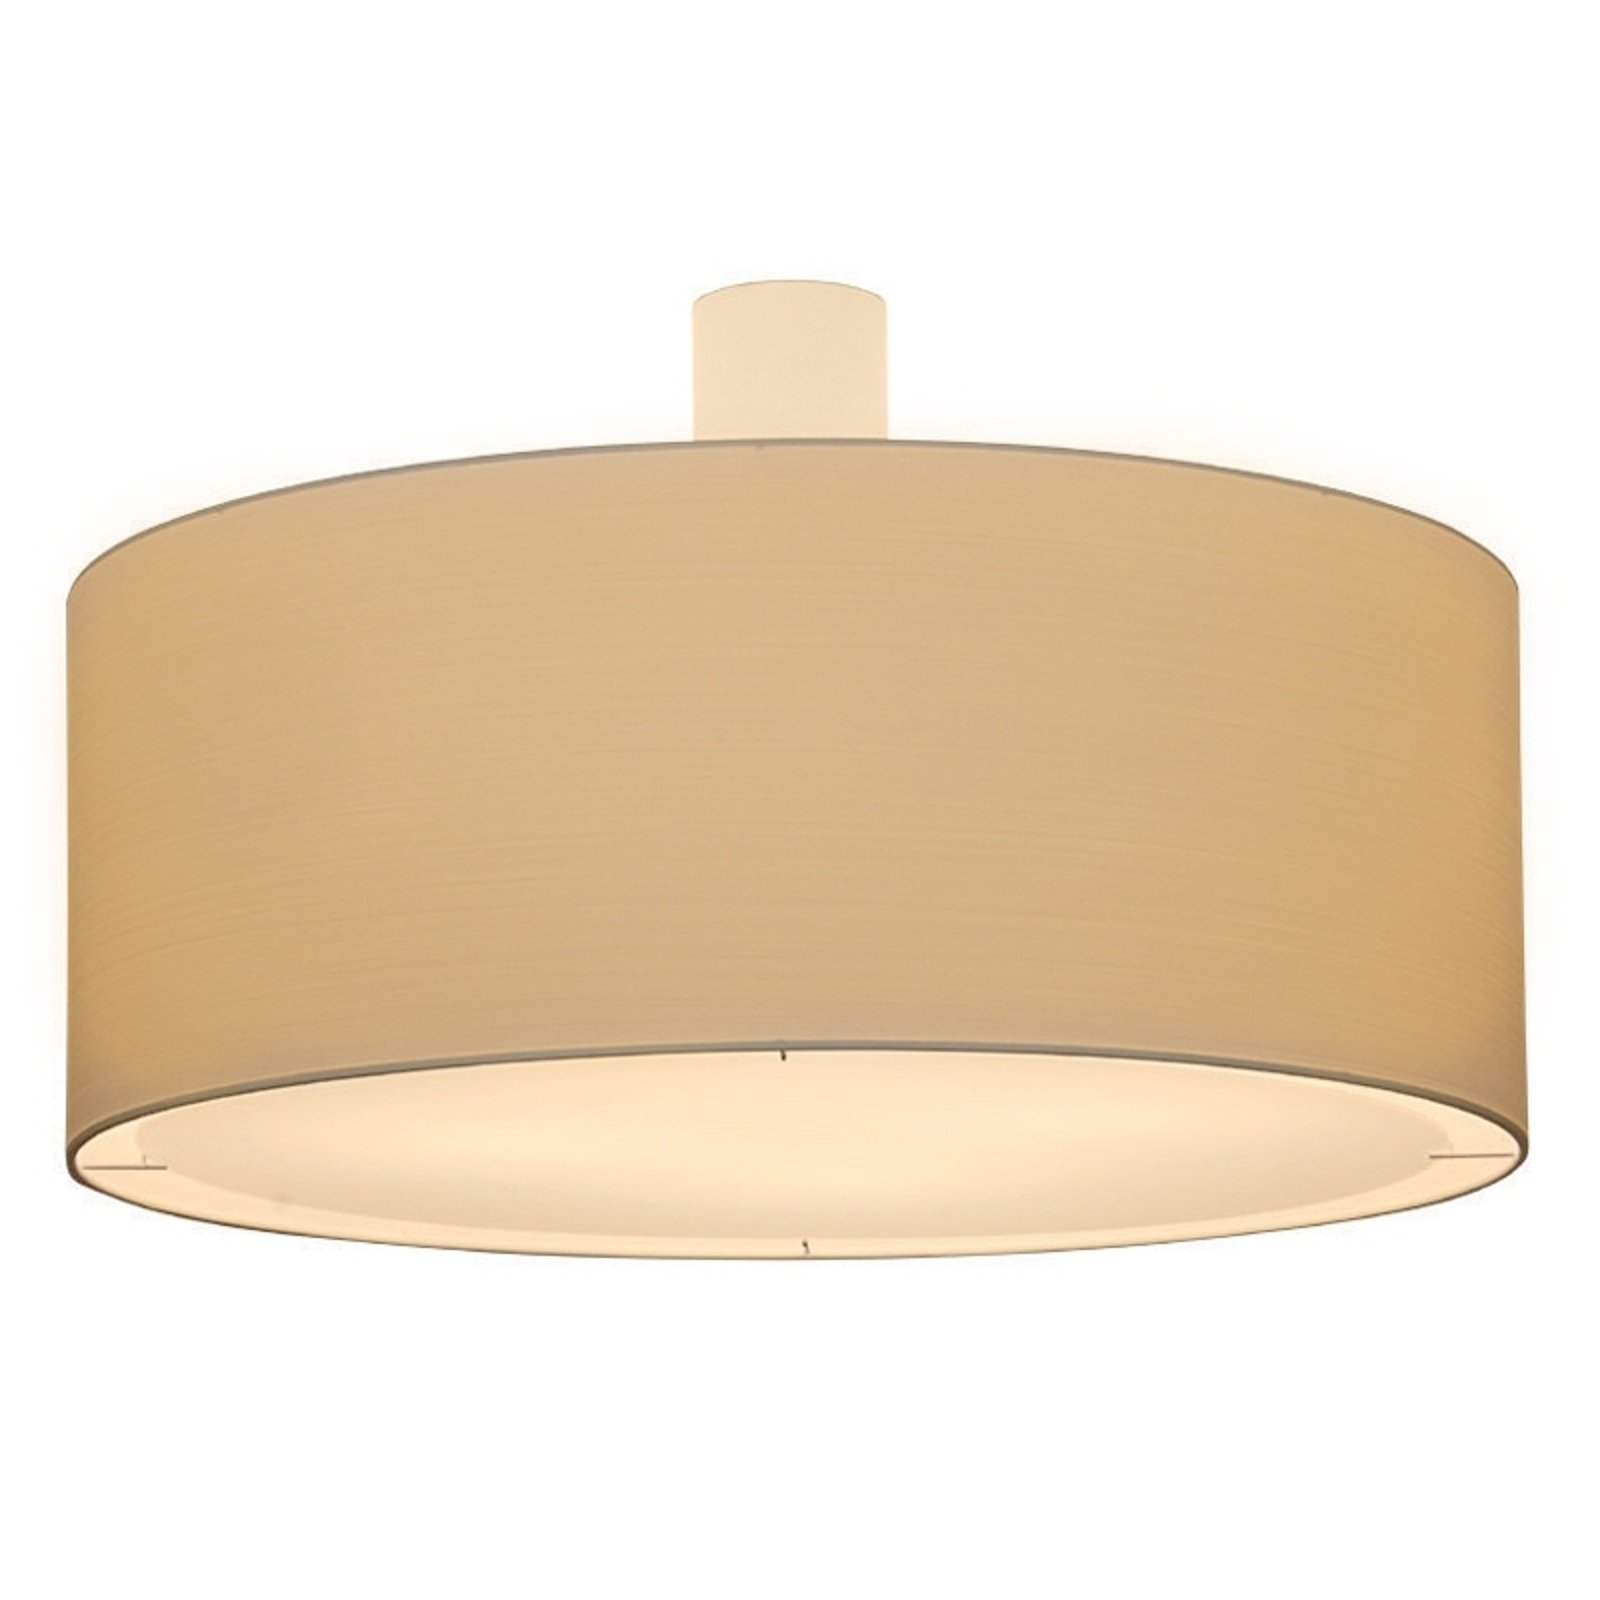 Kremfarget taklampe LIVING ELEGANT Ø 100 cm